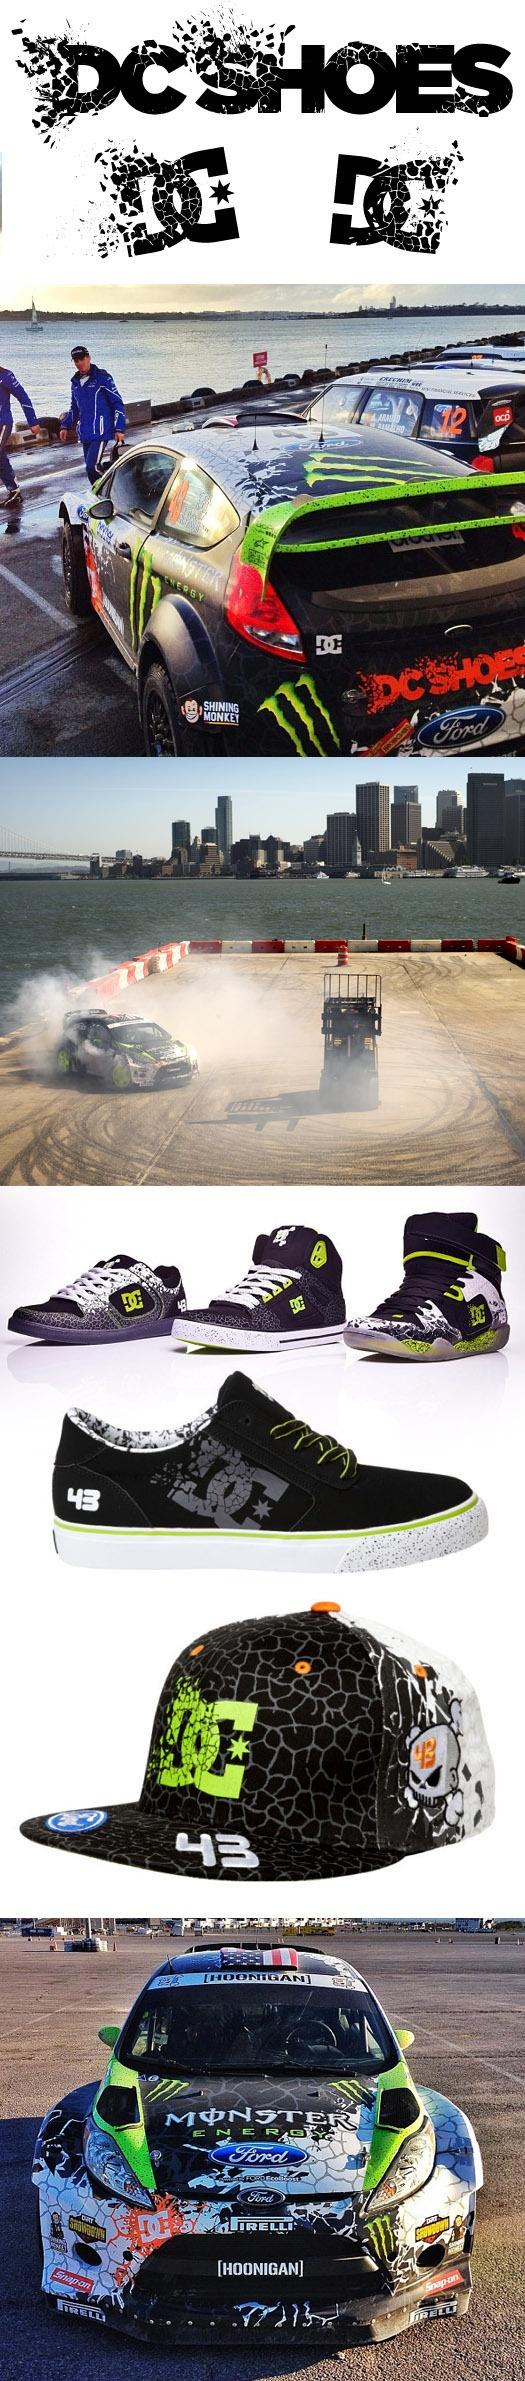 DC Shoes / Ken Block Branding & Vehicle Graphics by SoupGraphix Inc. , via Behance